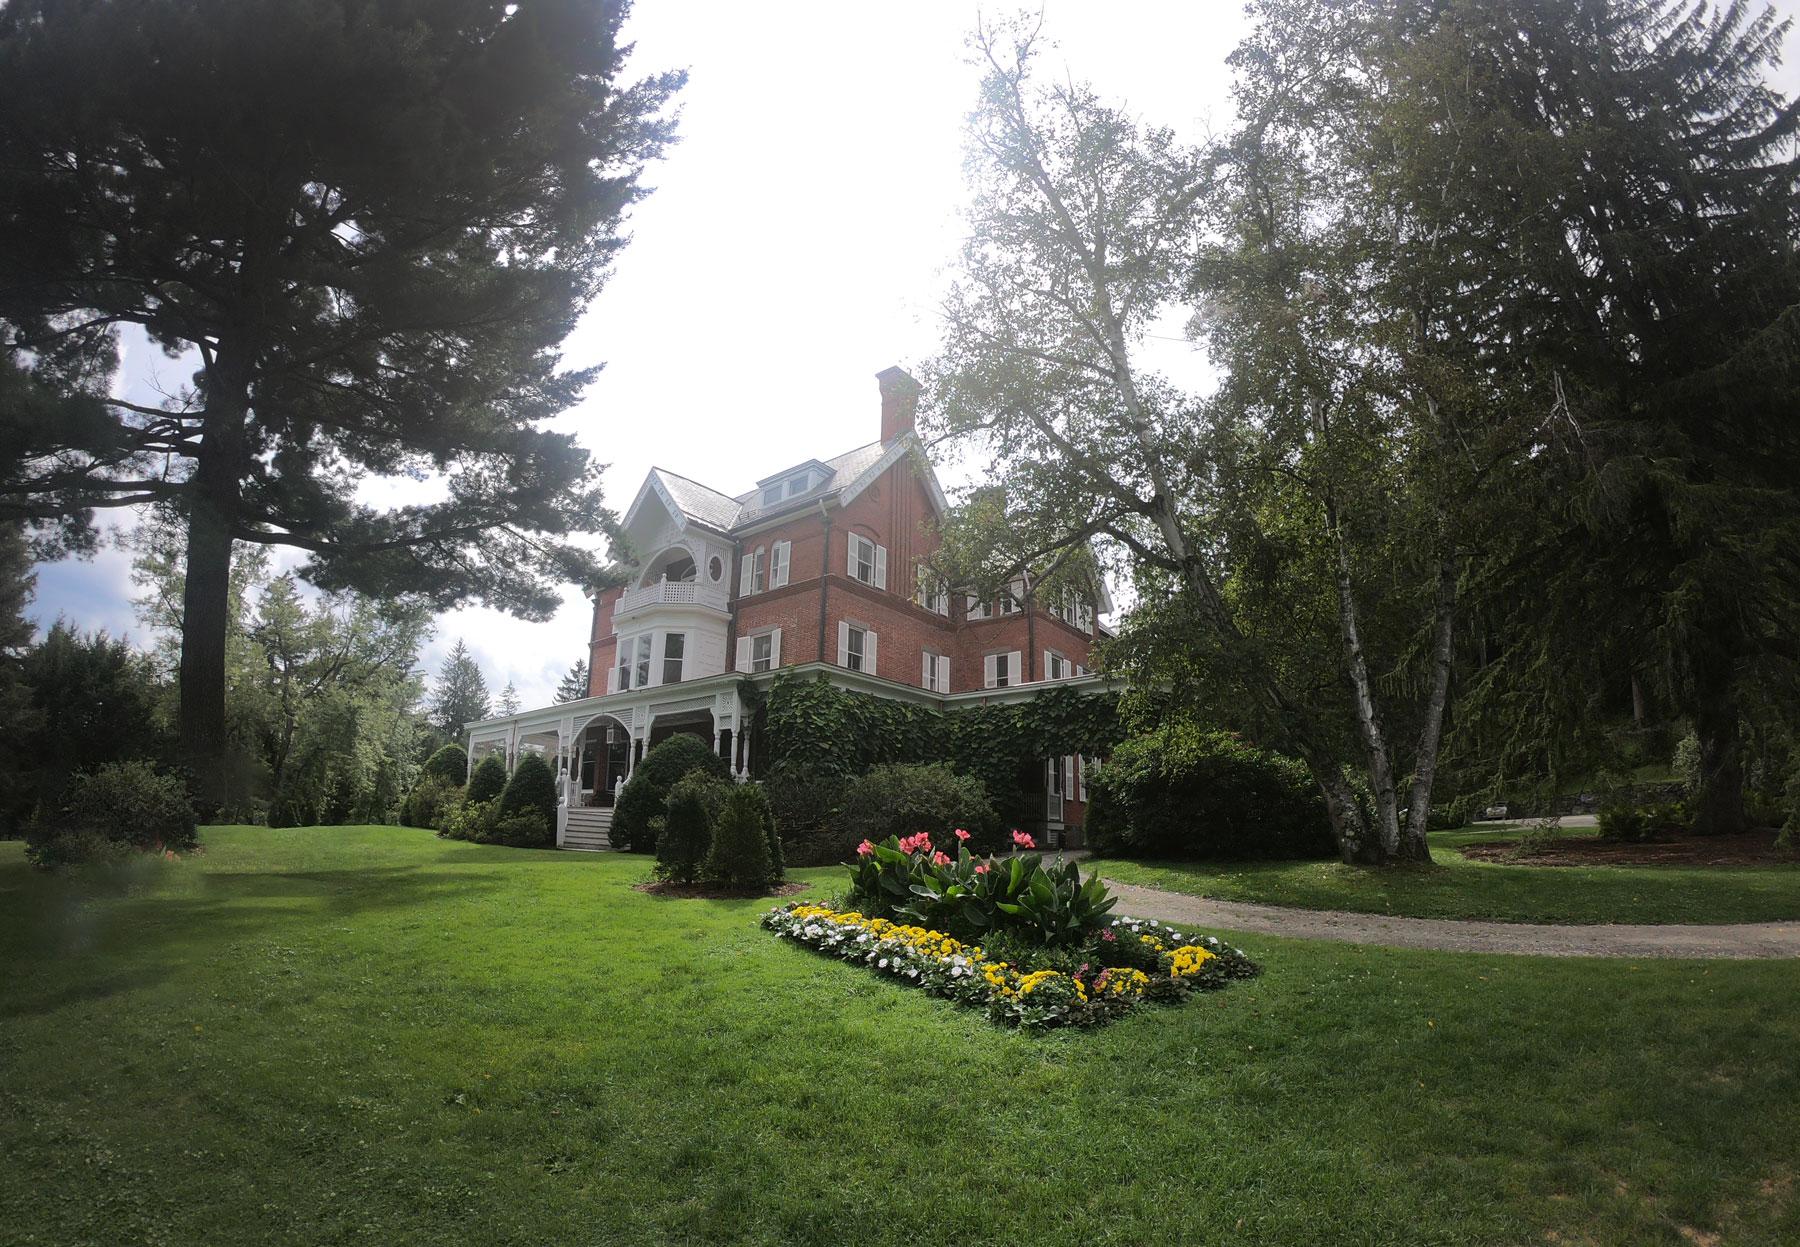 Exterior of mansion at Marsh Billings Rockefeller National Historic Park in Vermont